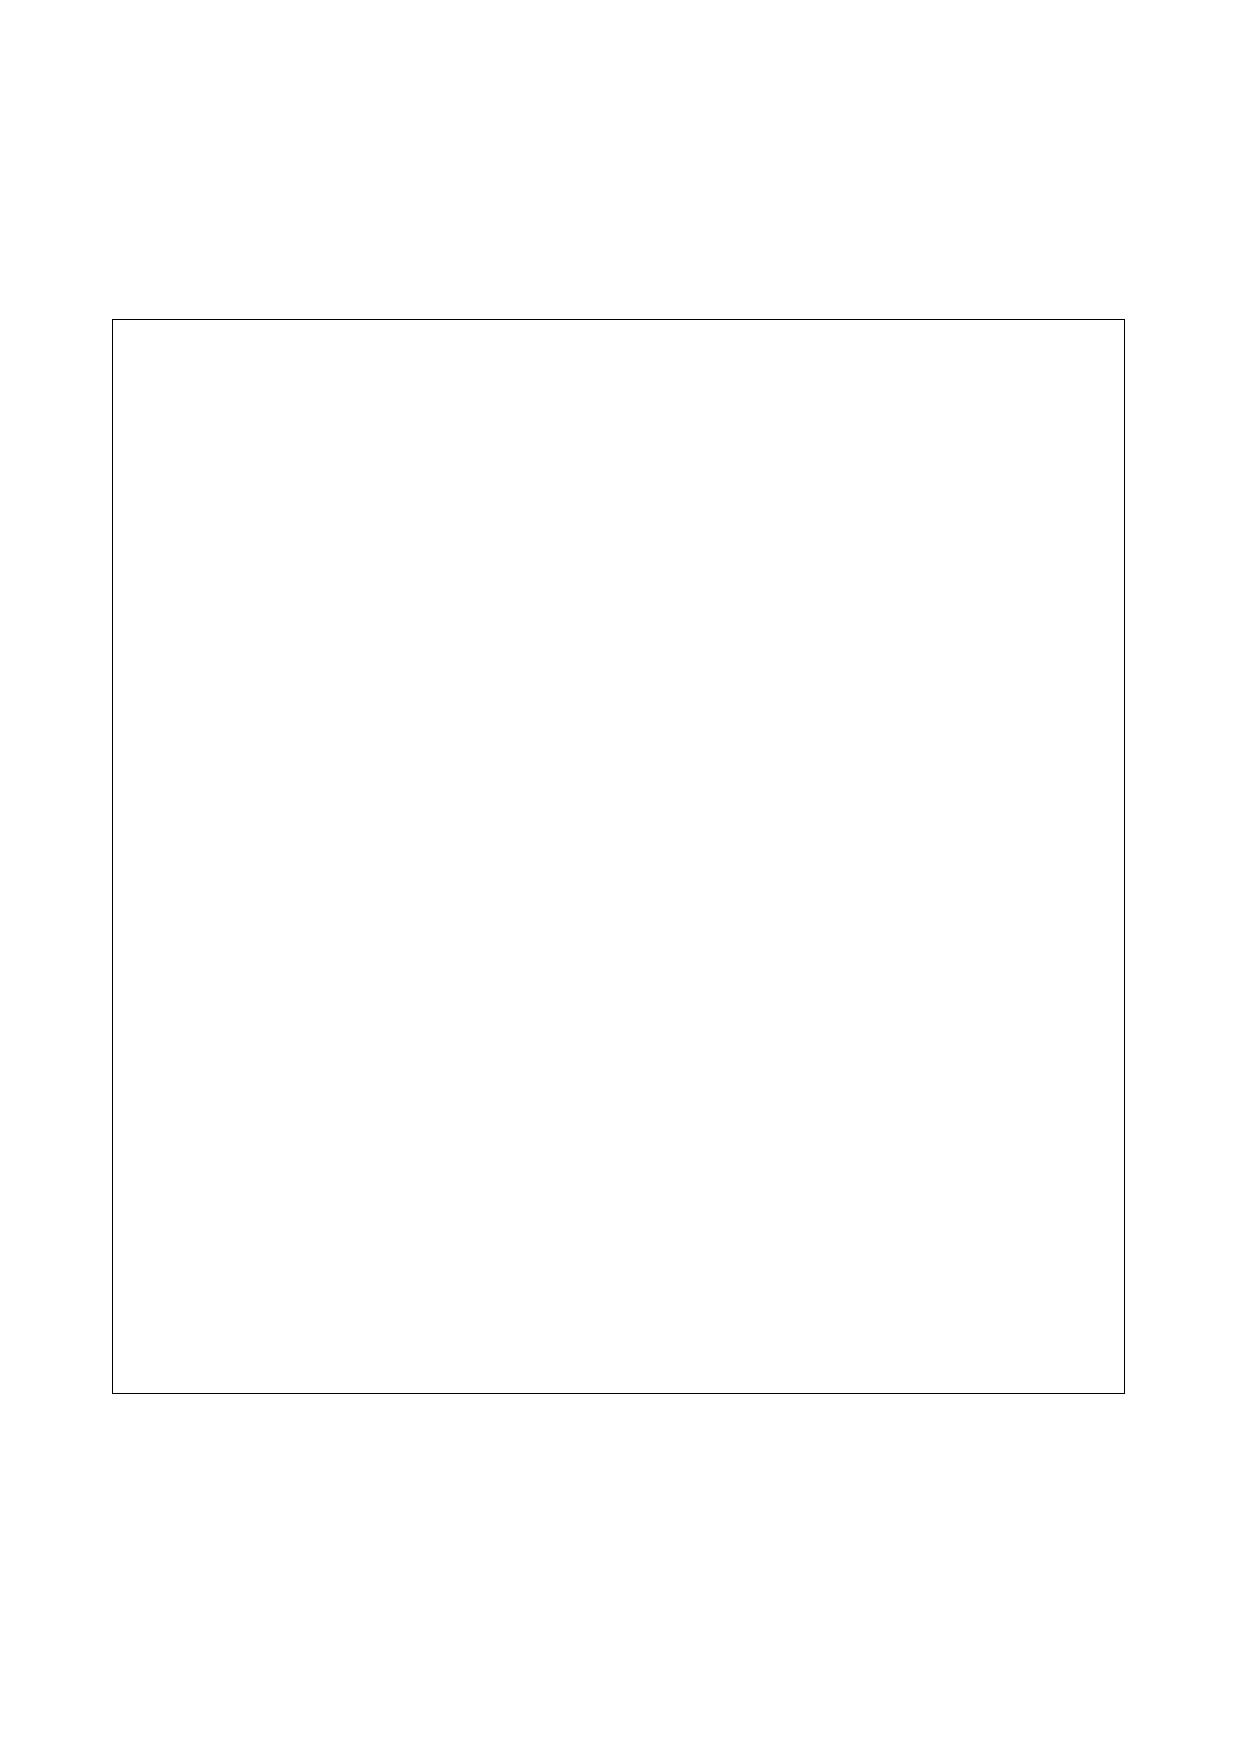 R5F51136ADFM pdf, 반도체, 판매, 대치품